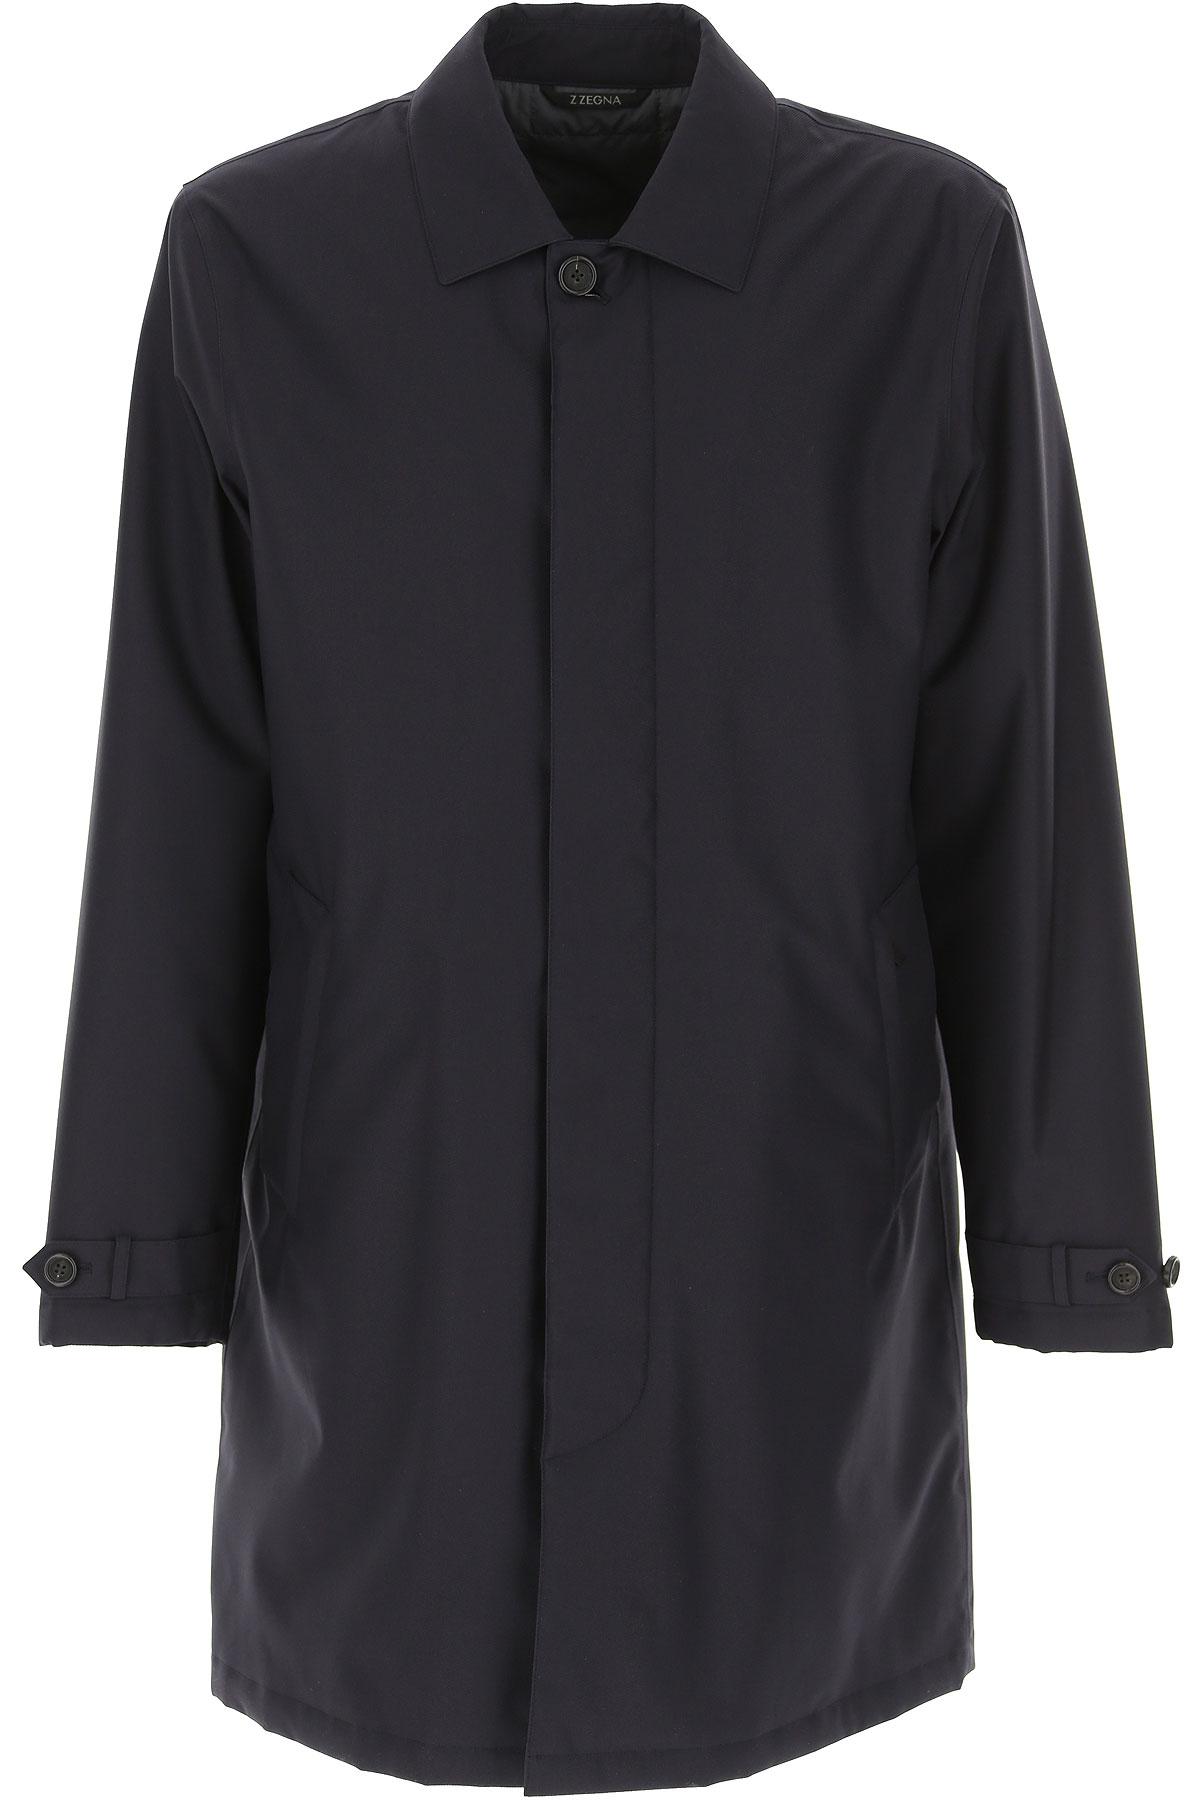 Ermenegildo Zegna Jacket for Men On Sale, Blue Navy, polyester, 2019, L M XL